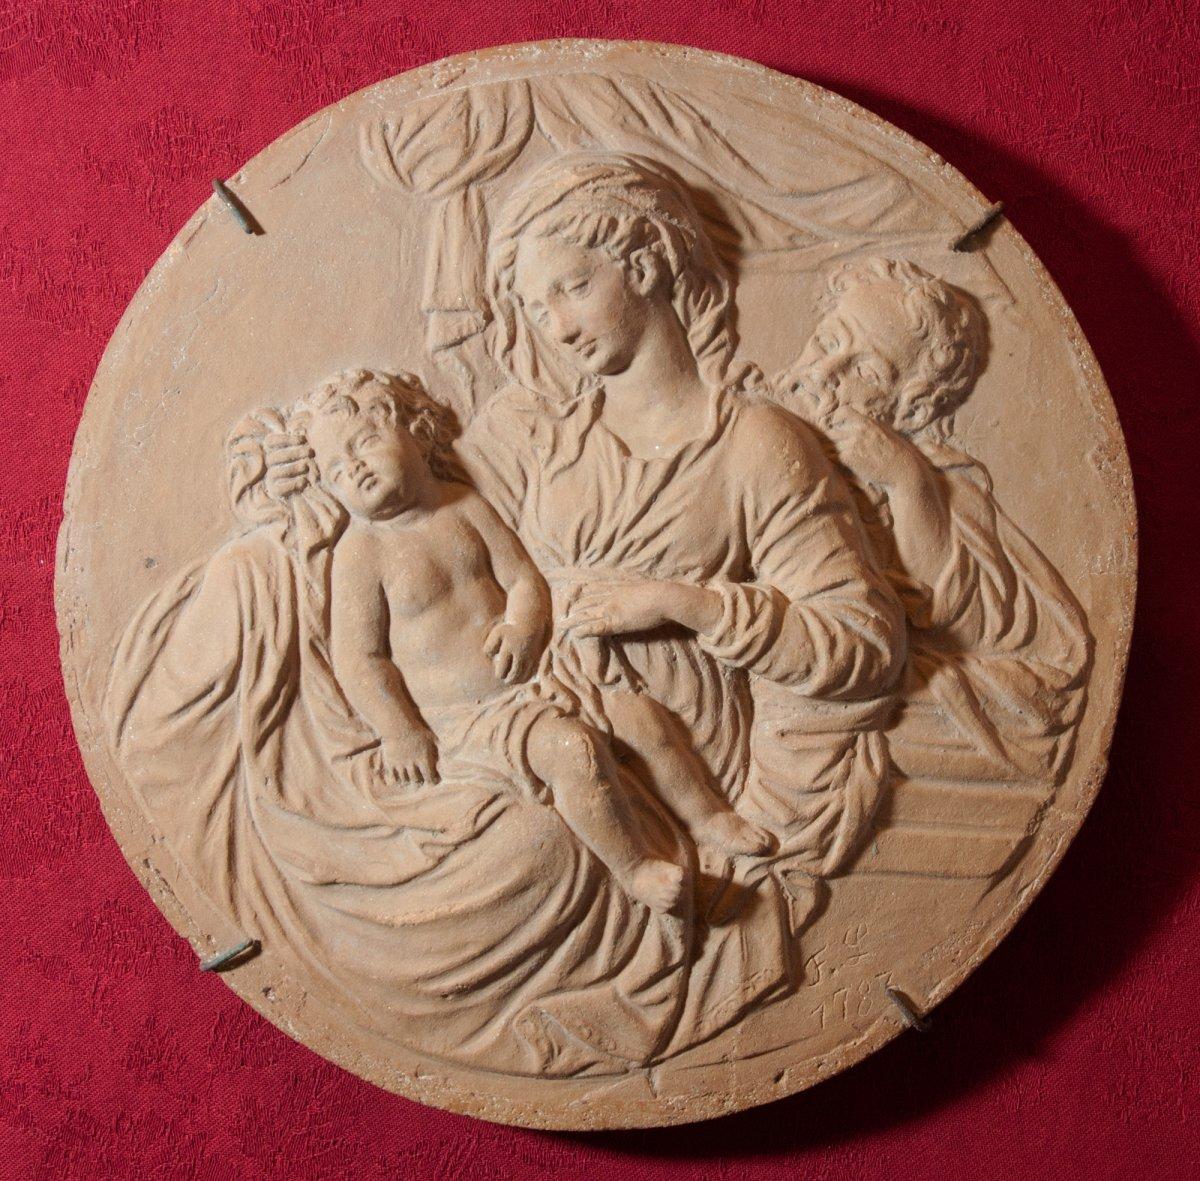 Tondo en terre cuite repr sentant la sainte famille 1783 xviiie si cle - Symbole representant la famille ...